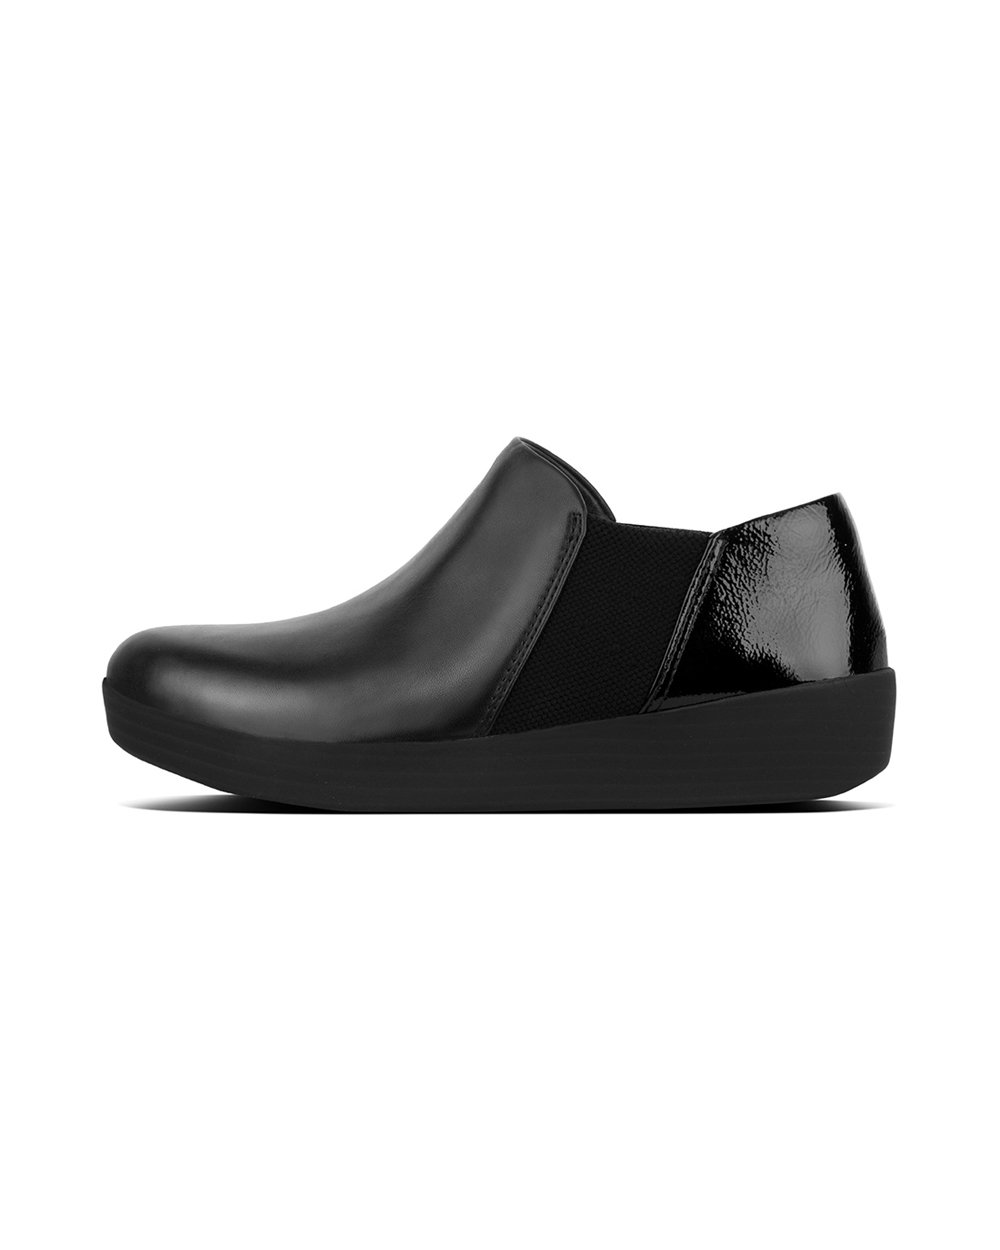 Fitflop Superchelsea Slip-Ons Shoes 36 EU Negro (Black/Black Patent)